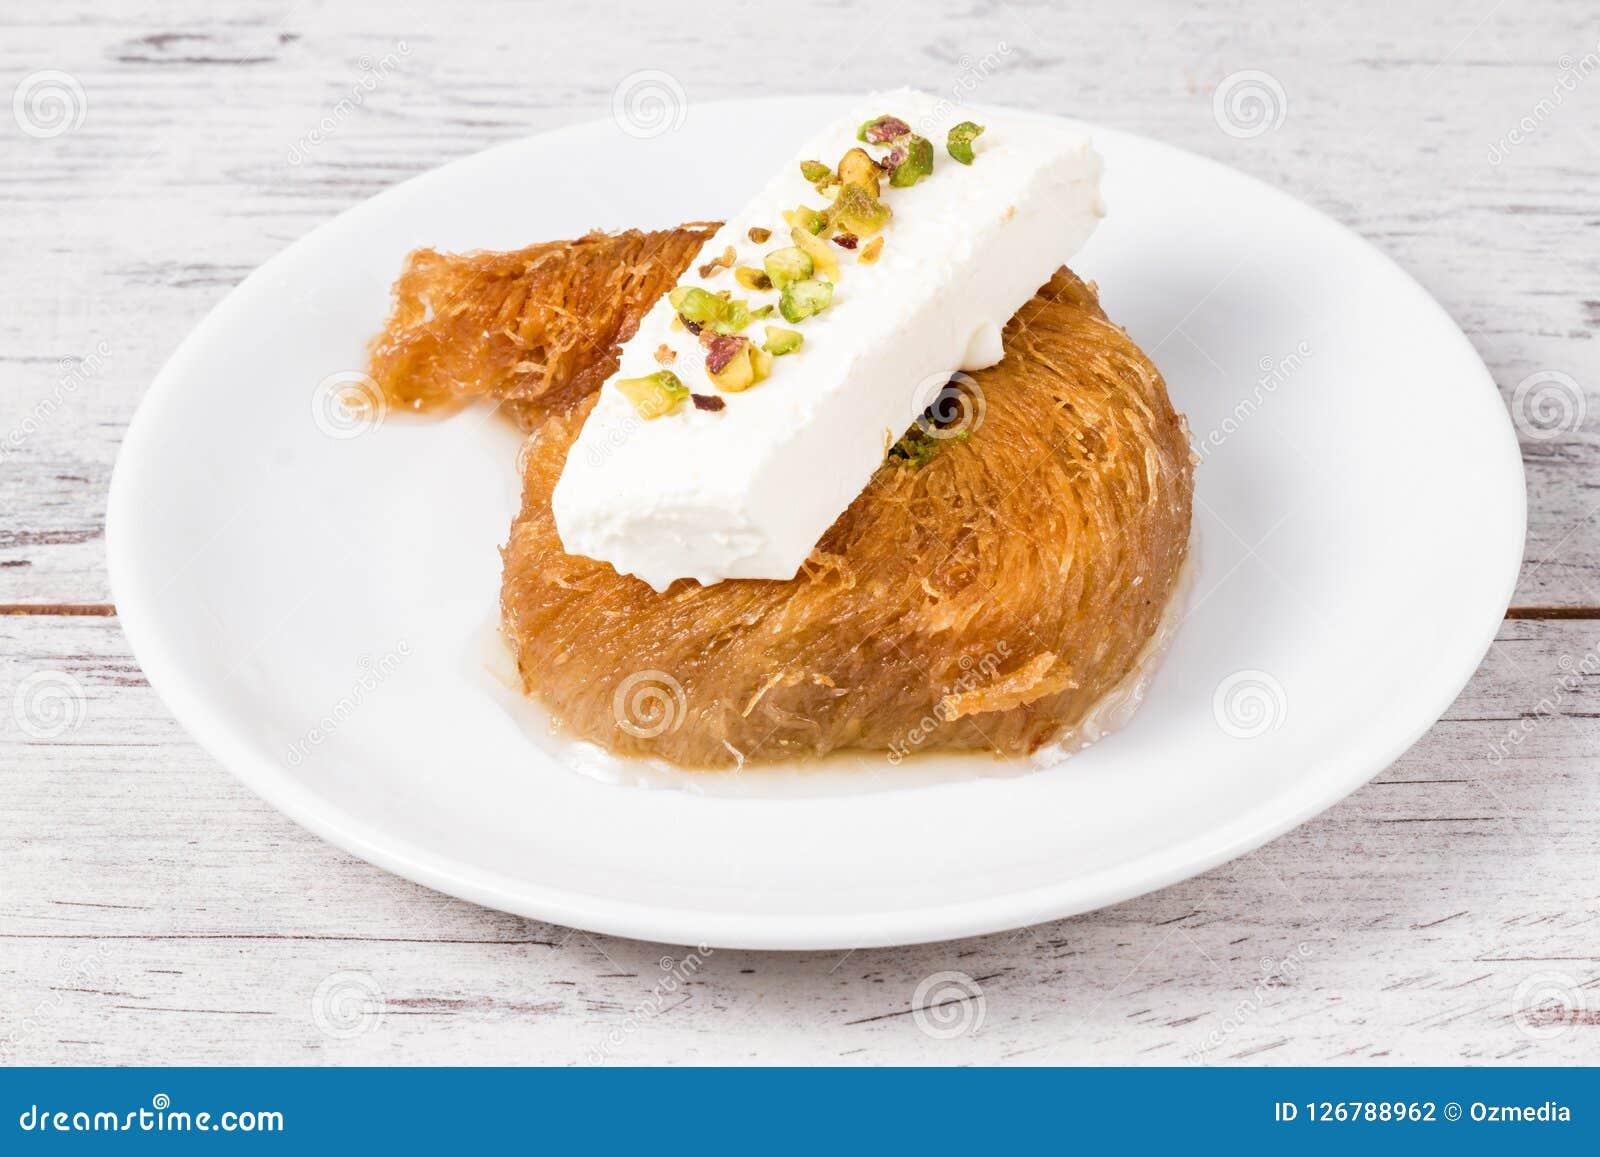 Pâtisserie crémeuse douce de style turc, Kadayif